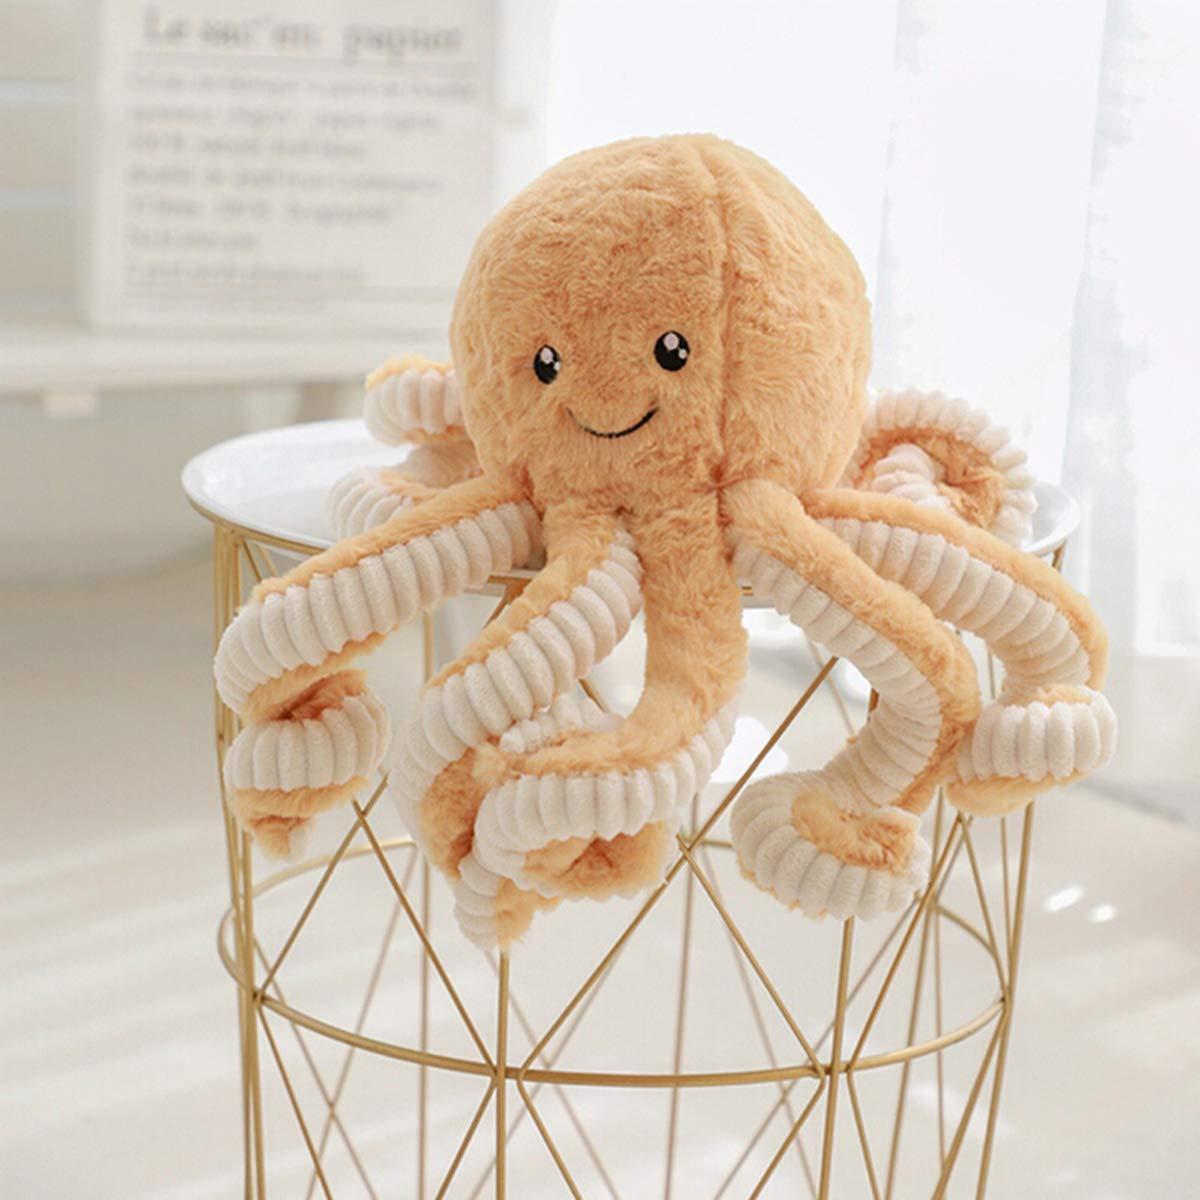 Cute Stuffed Plush Animal Octopus Kawaii Plush Stuffed Gift Doll Saft Toys